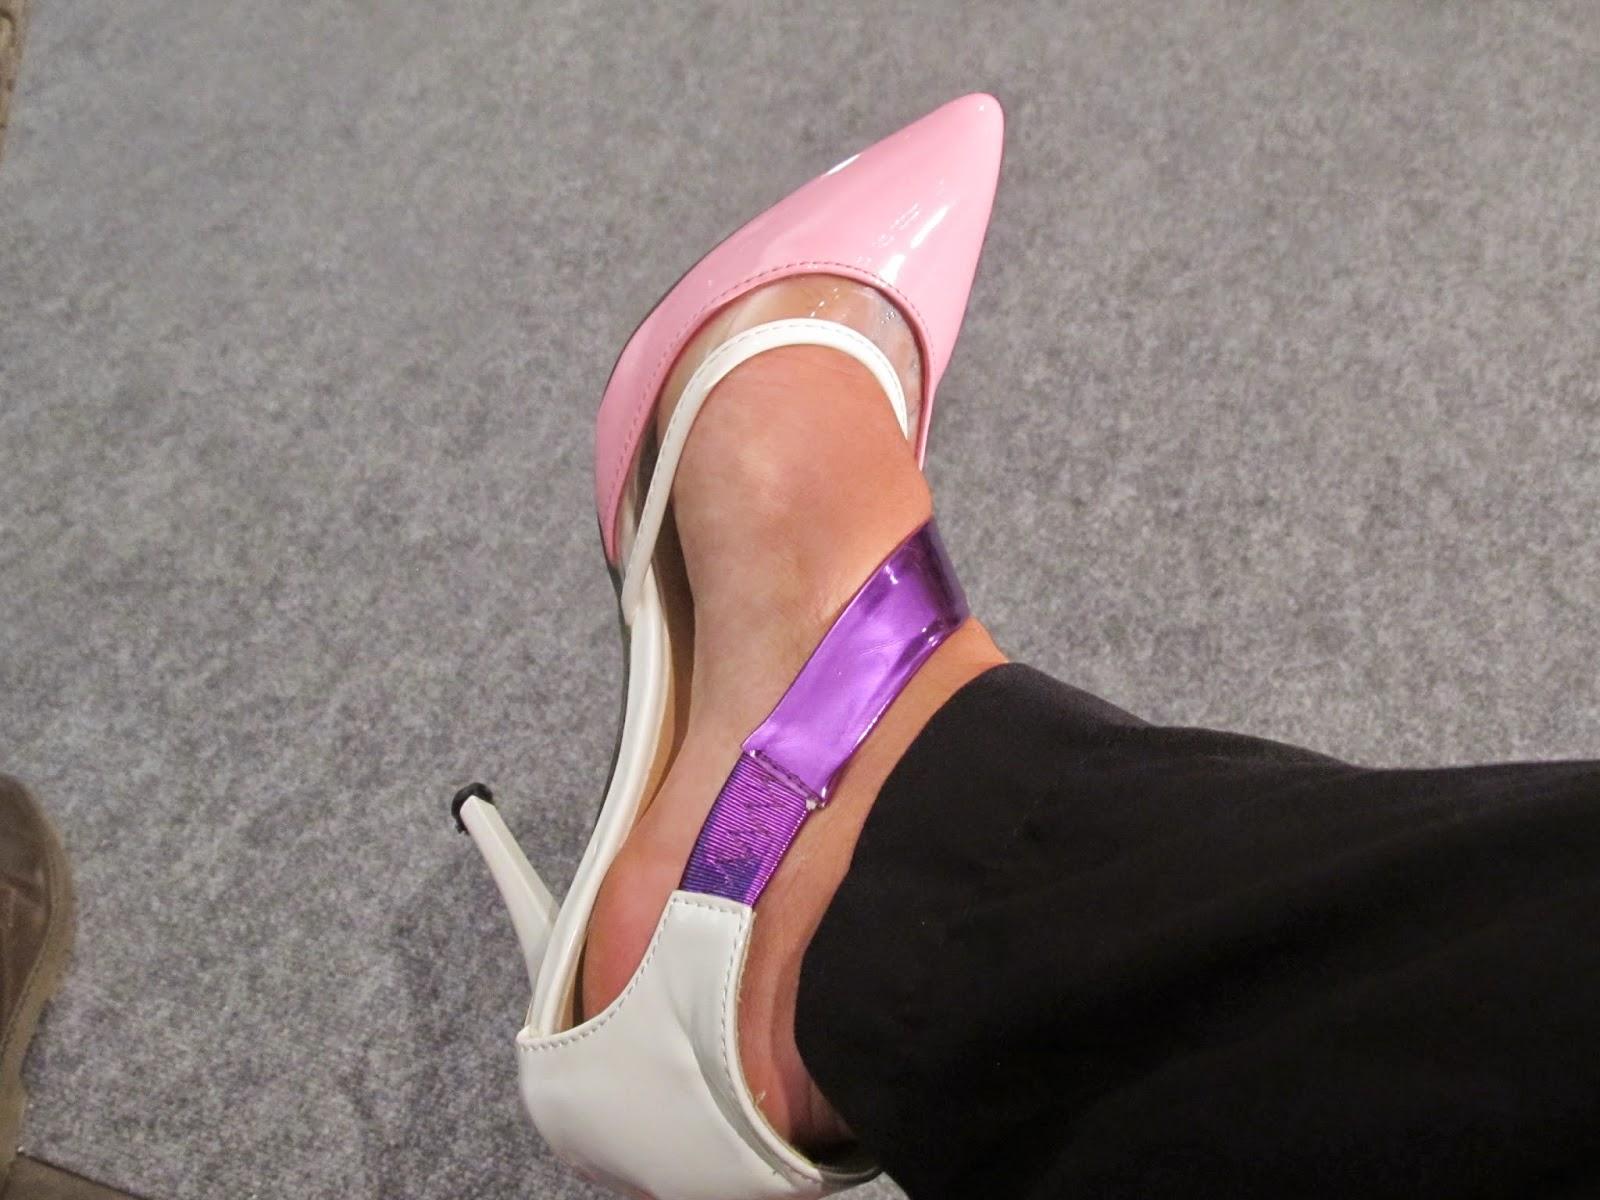 comprar zapatos comodos choies rosa lila blanco